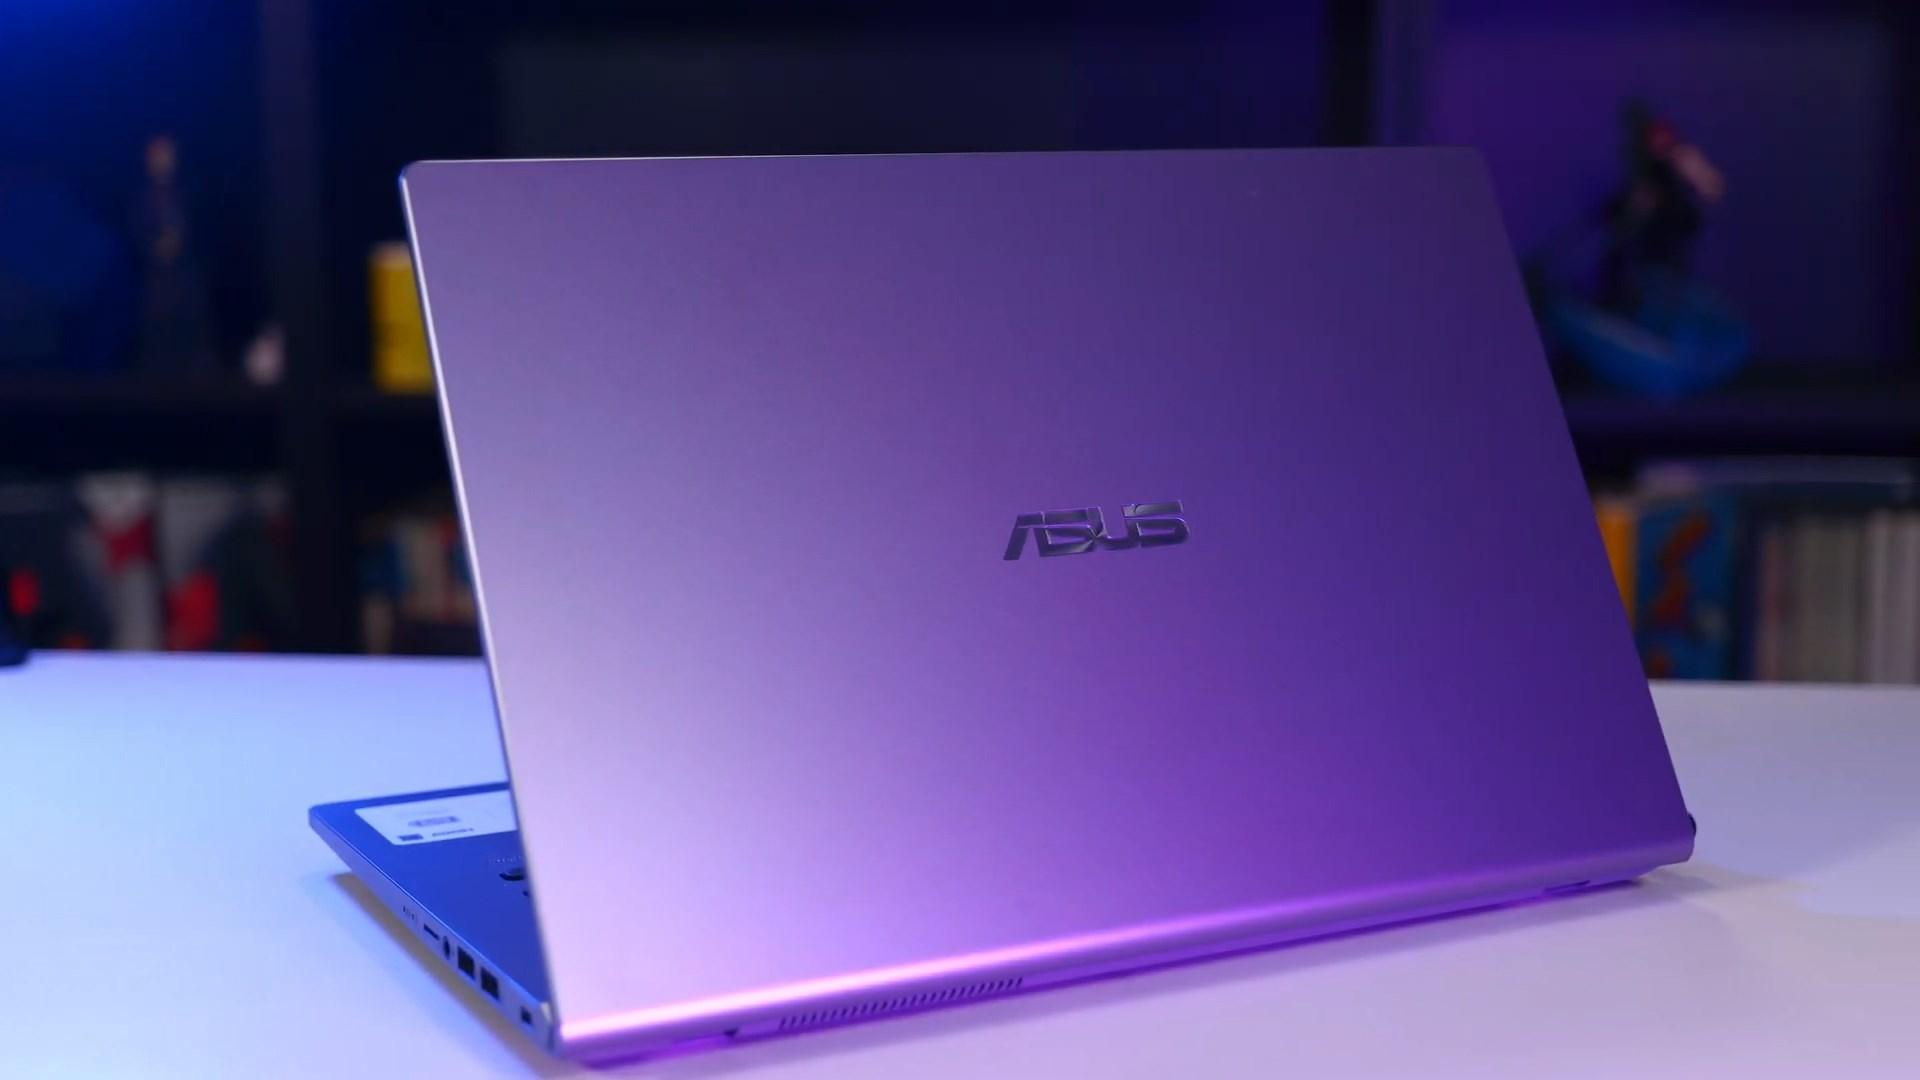 ASUS D409D FreeDOS Laptop